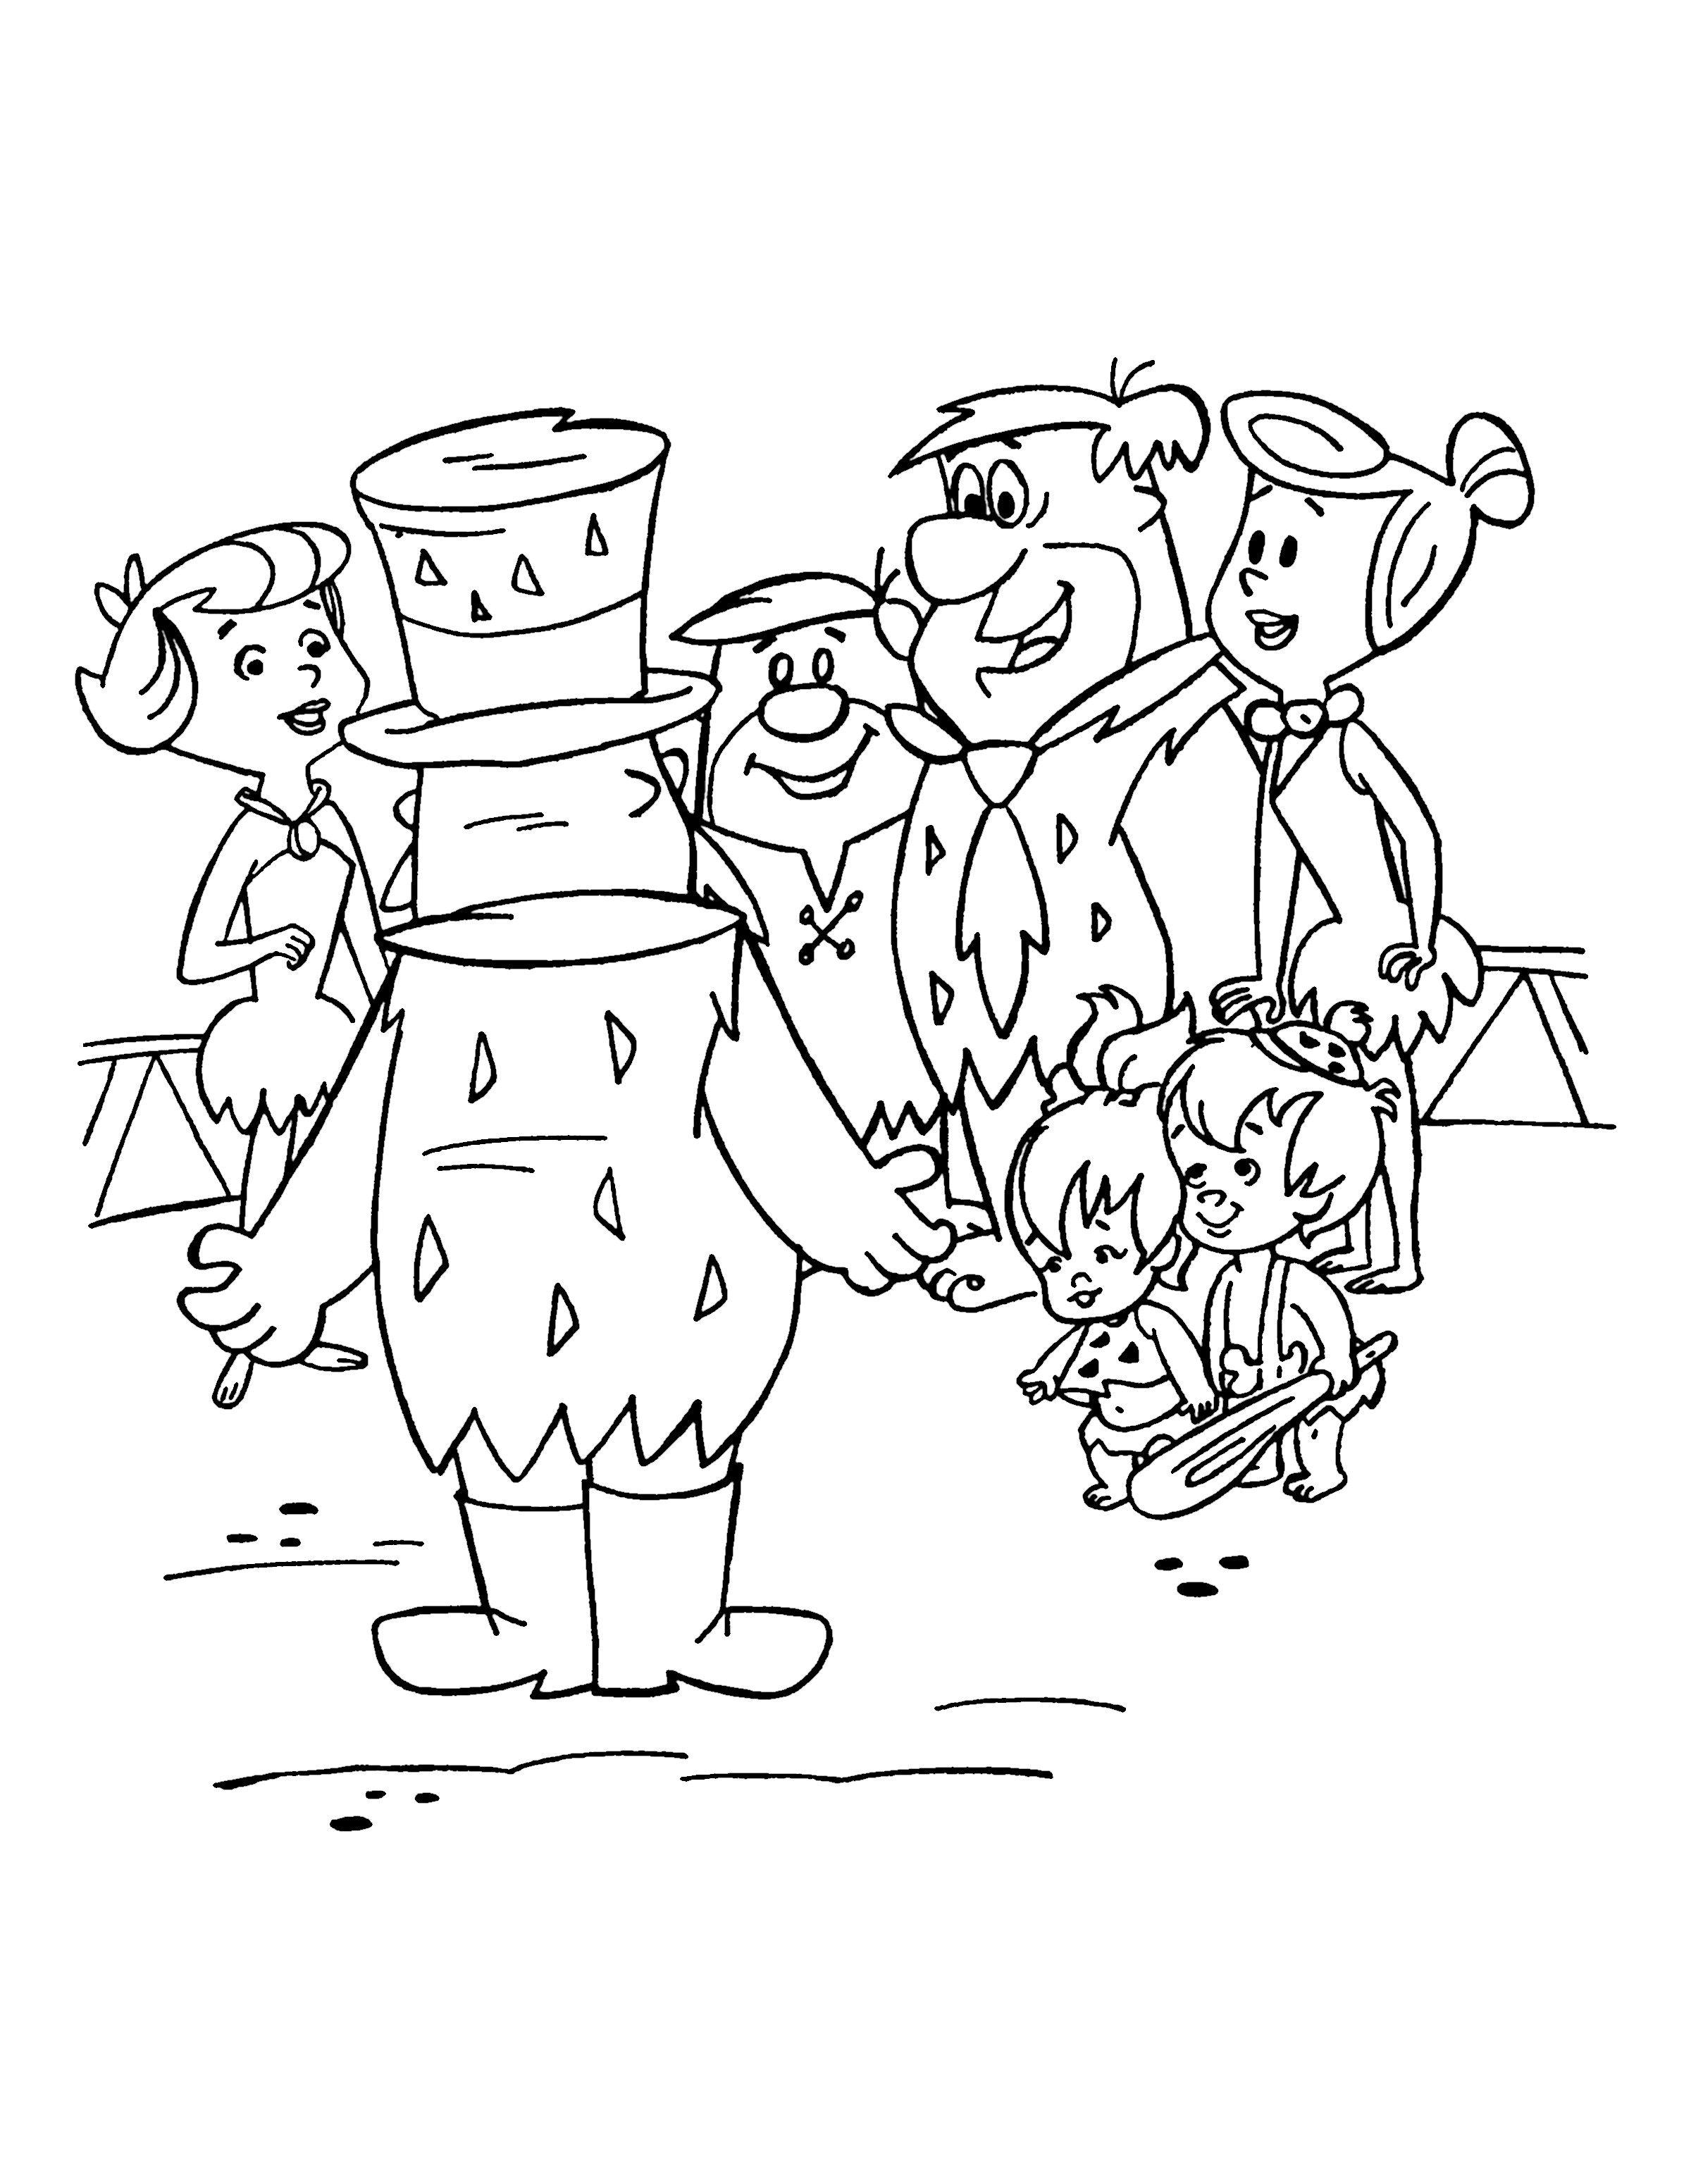 Desenhos para pintar Os Flintstones 14 | Pintura ante estres ...